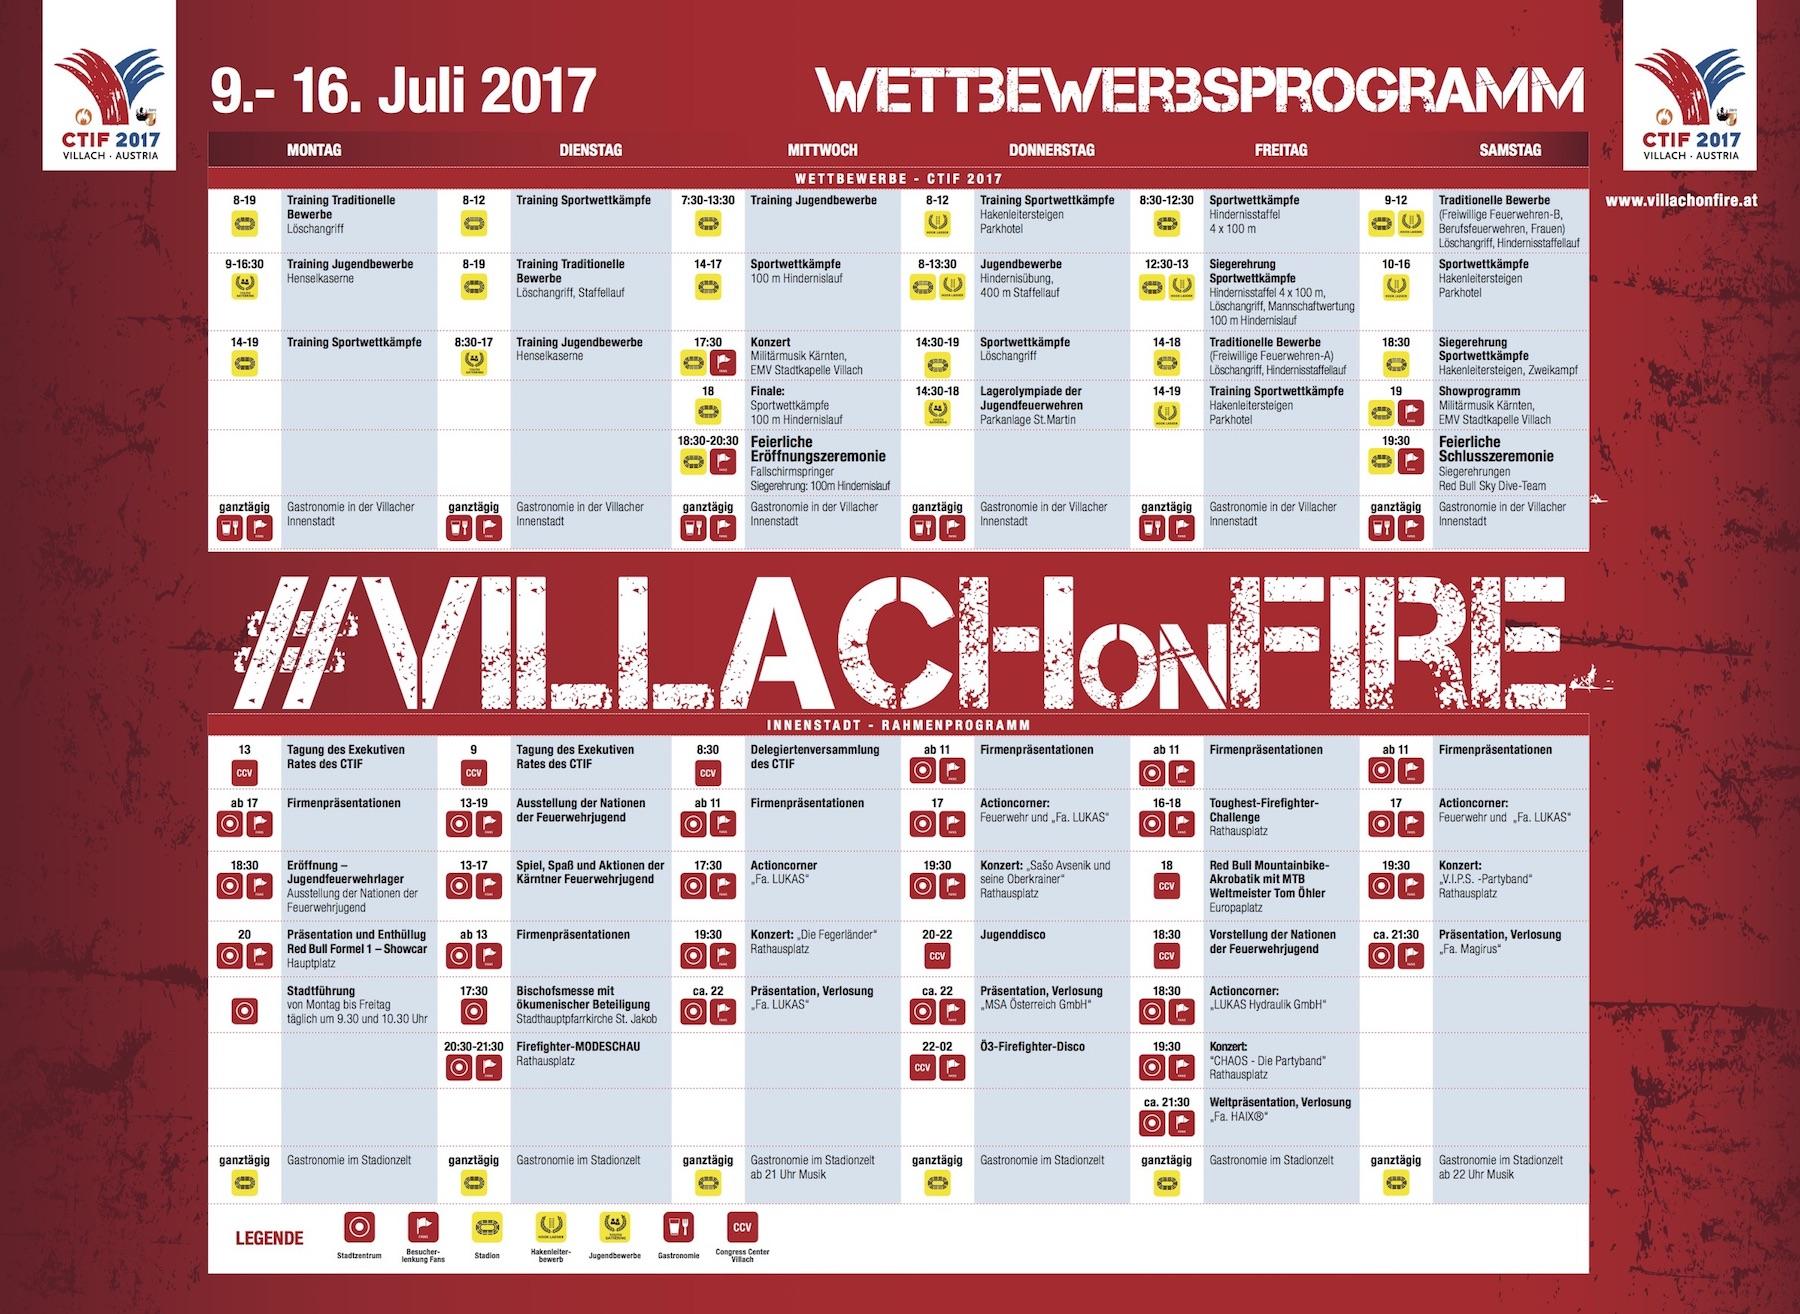 http://www.villachonfire.at/wp-content/uploads/2017/07/feuerwehrolympiade_2017_Programm_Druckdatei_406x297_NEU.jpg